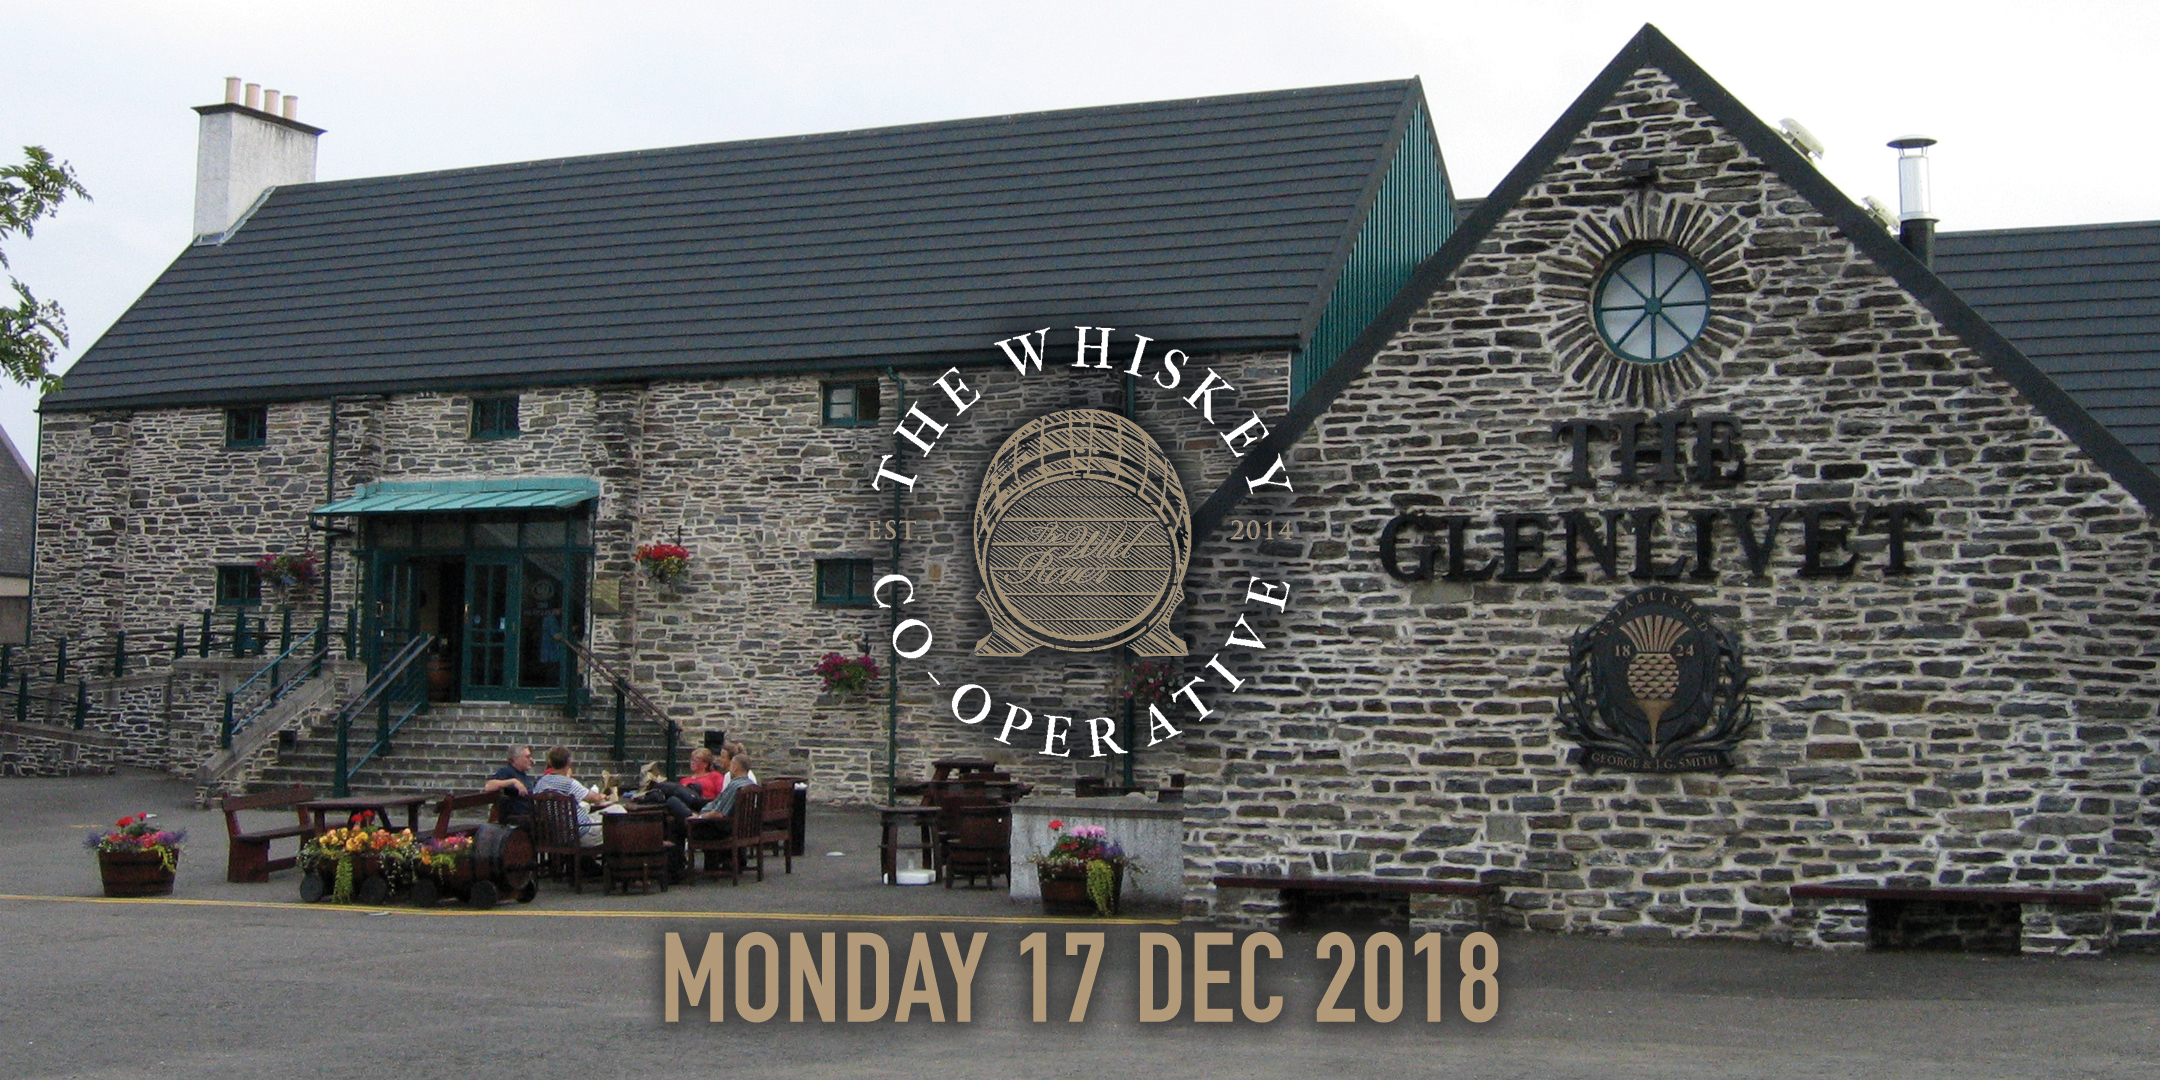 WEB_The_Glenlivet_distillery.jpg